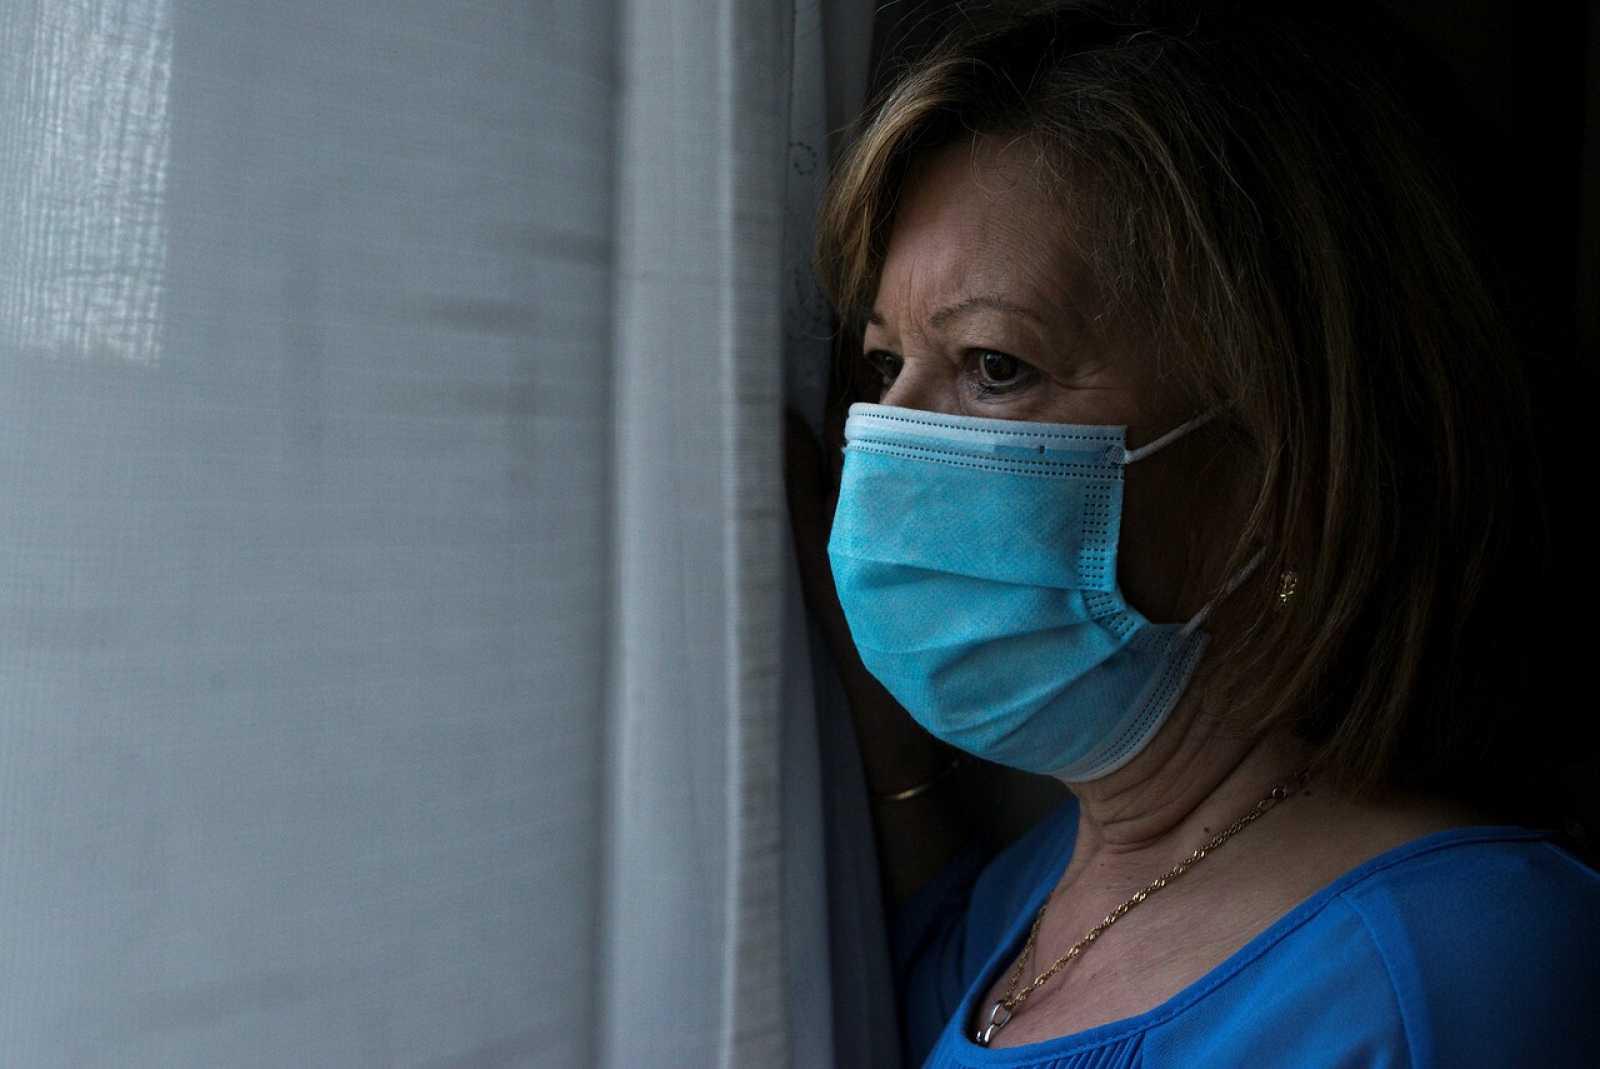 Los muertos en España diarios con coronavirus han sido 48, con contar Cataluña.